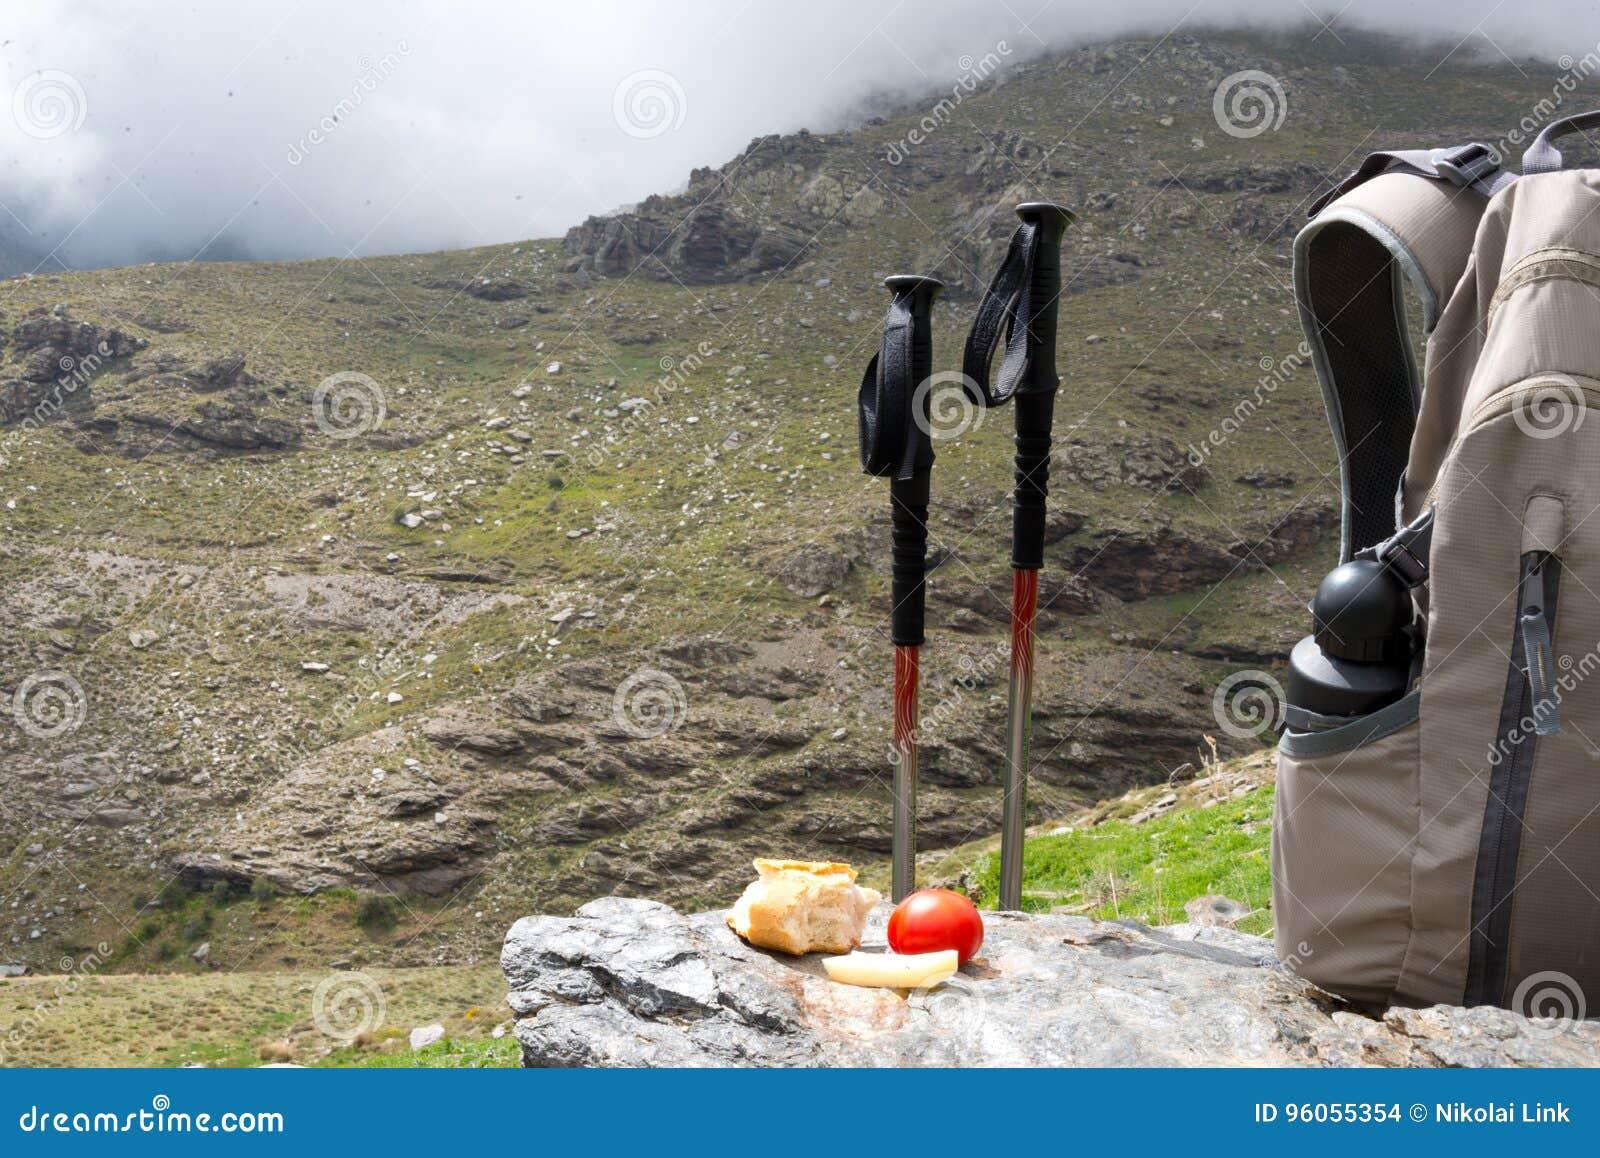 Déjeuner de trekking à la sierra Nevada, Espagne